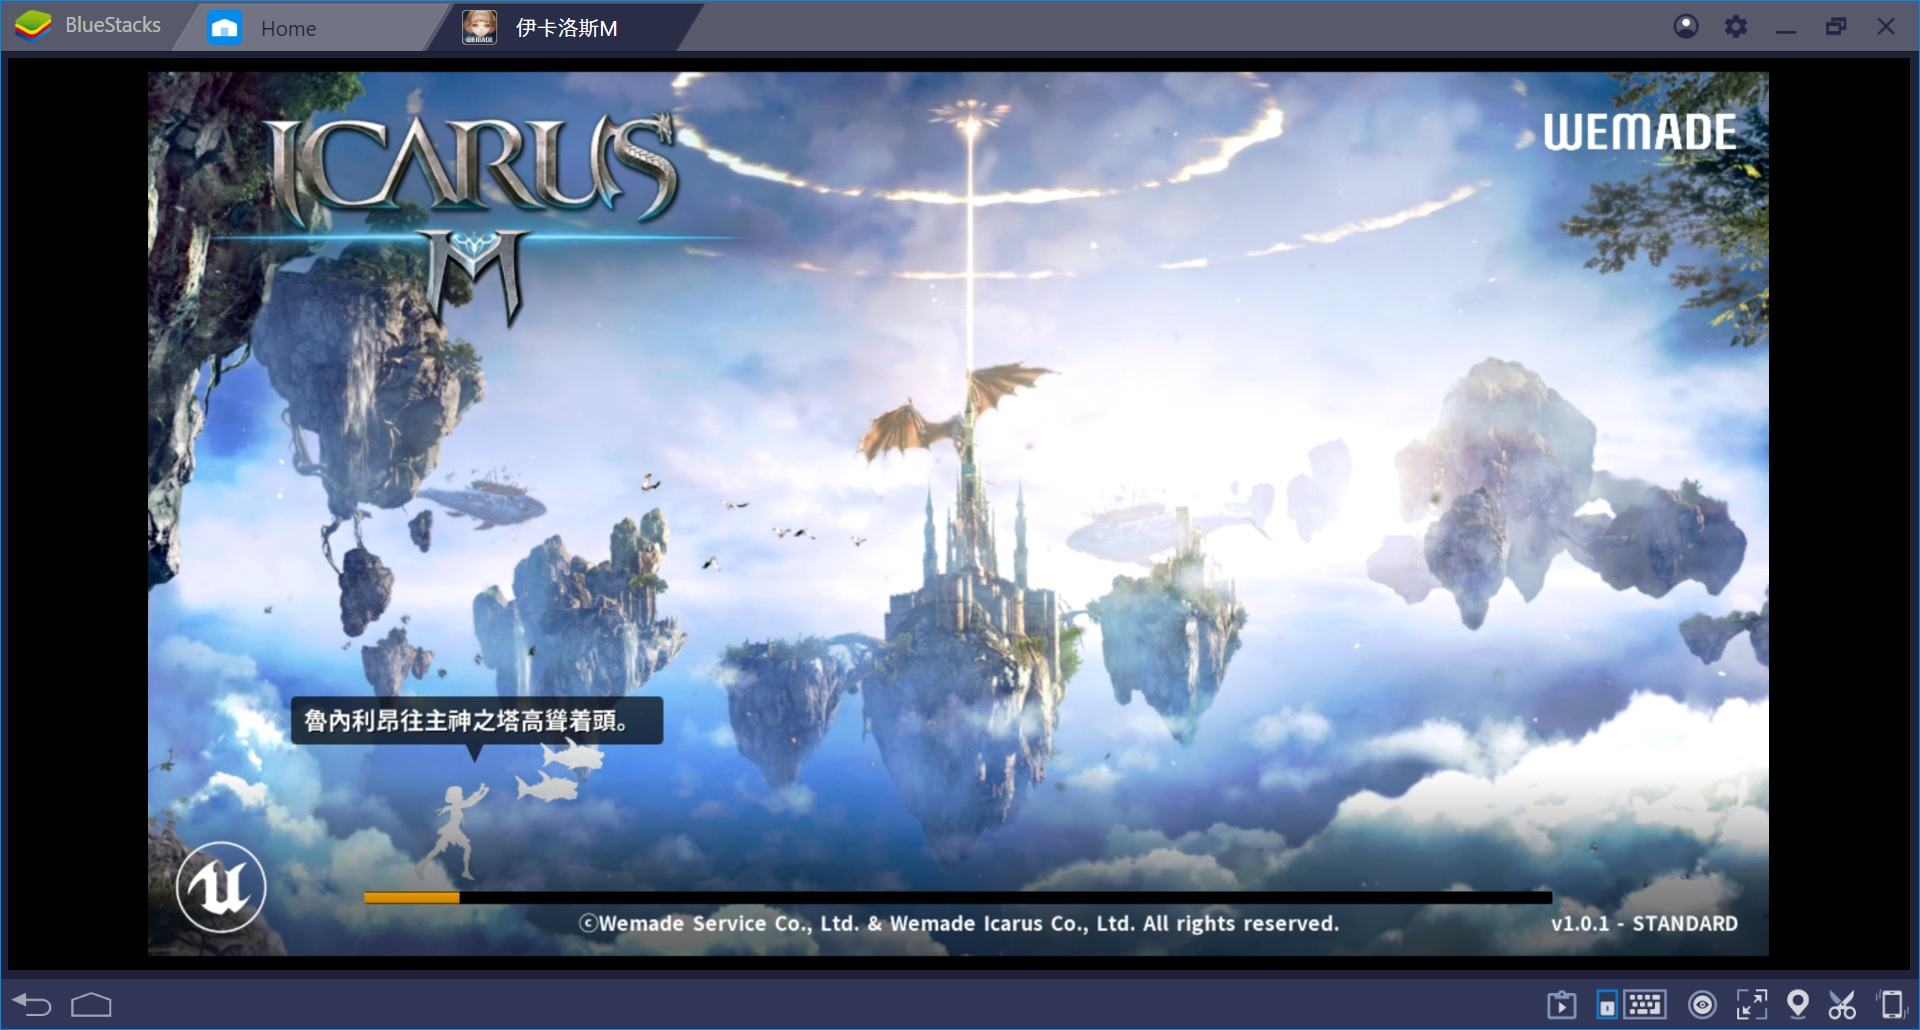 使用BlueStacks初次體驗《伊卡洛斯M – Icarus M》